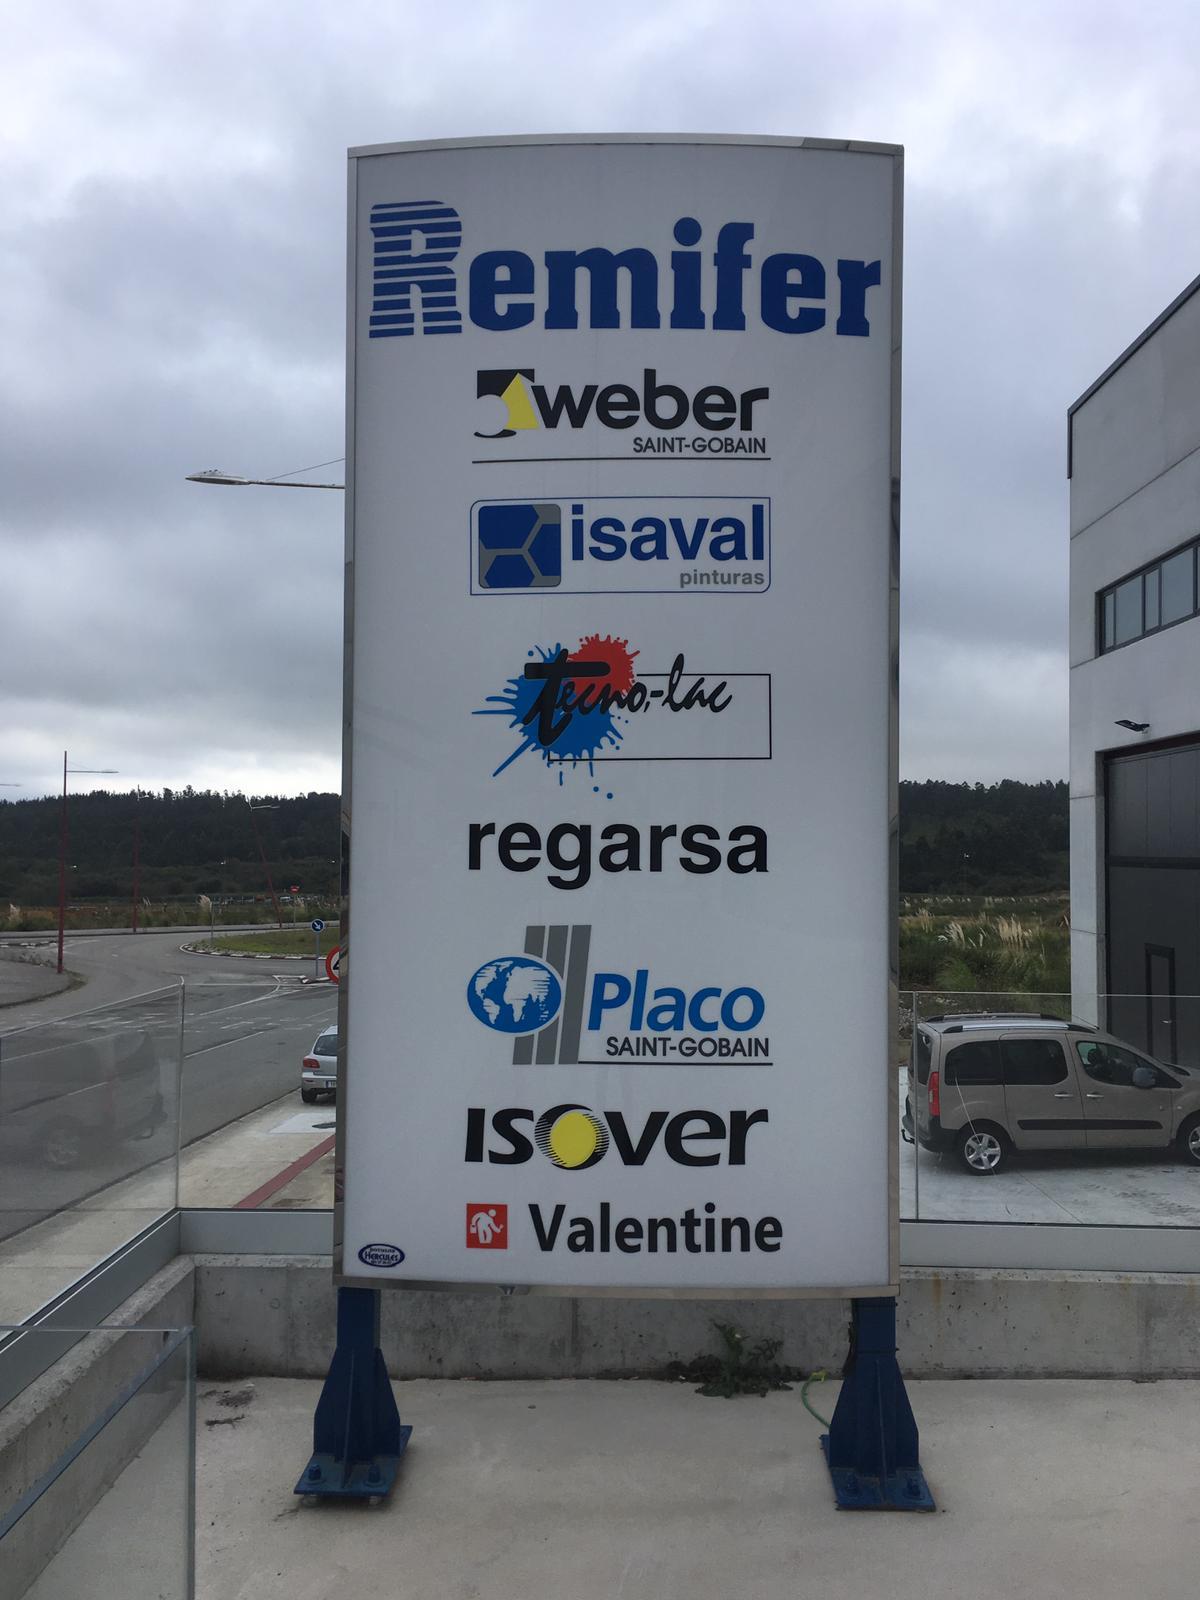 Somos distribuidores oficiales de las siguientes marcas:  * Weber (grupo Saint-Gobain) * Isaval * Tecno-lac * Regarsa * Placo (grupo Saint-Gobain) * Isover (grupo Saint-Gobain) * Valentine